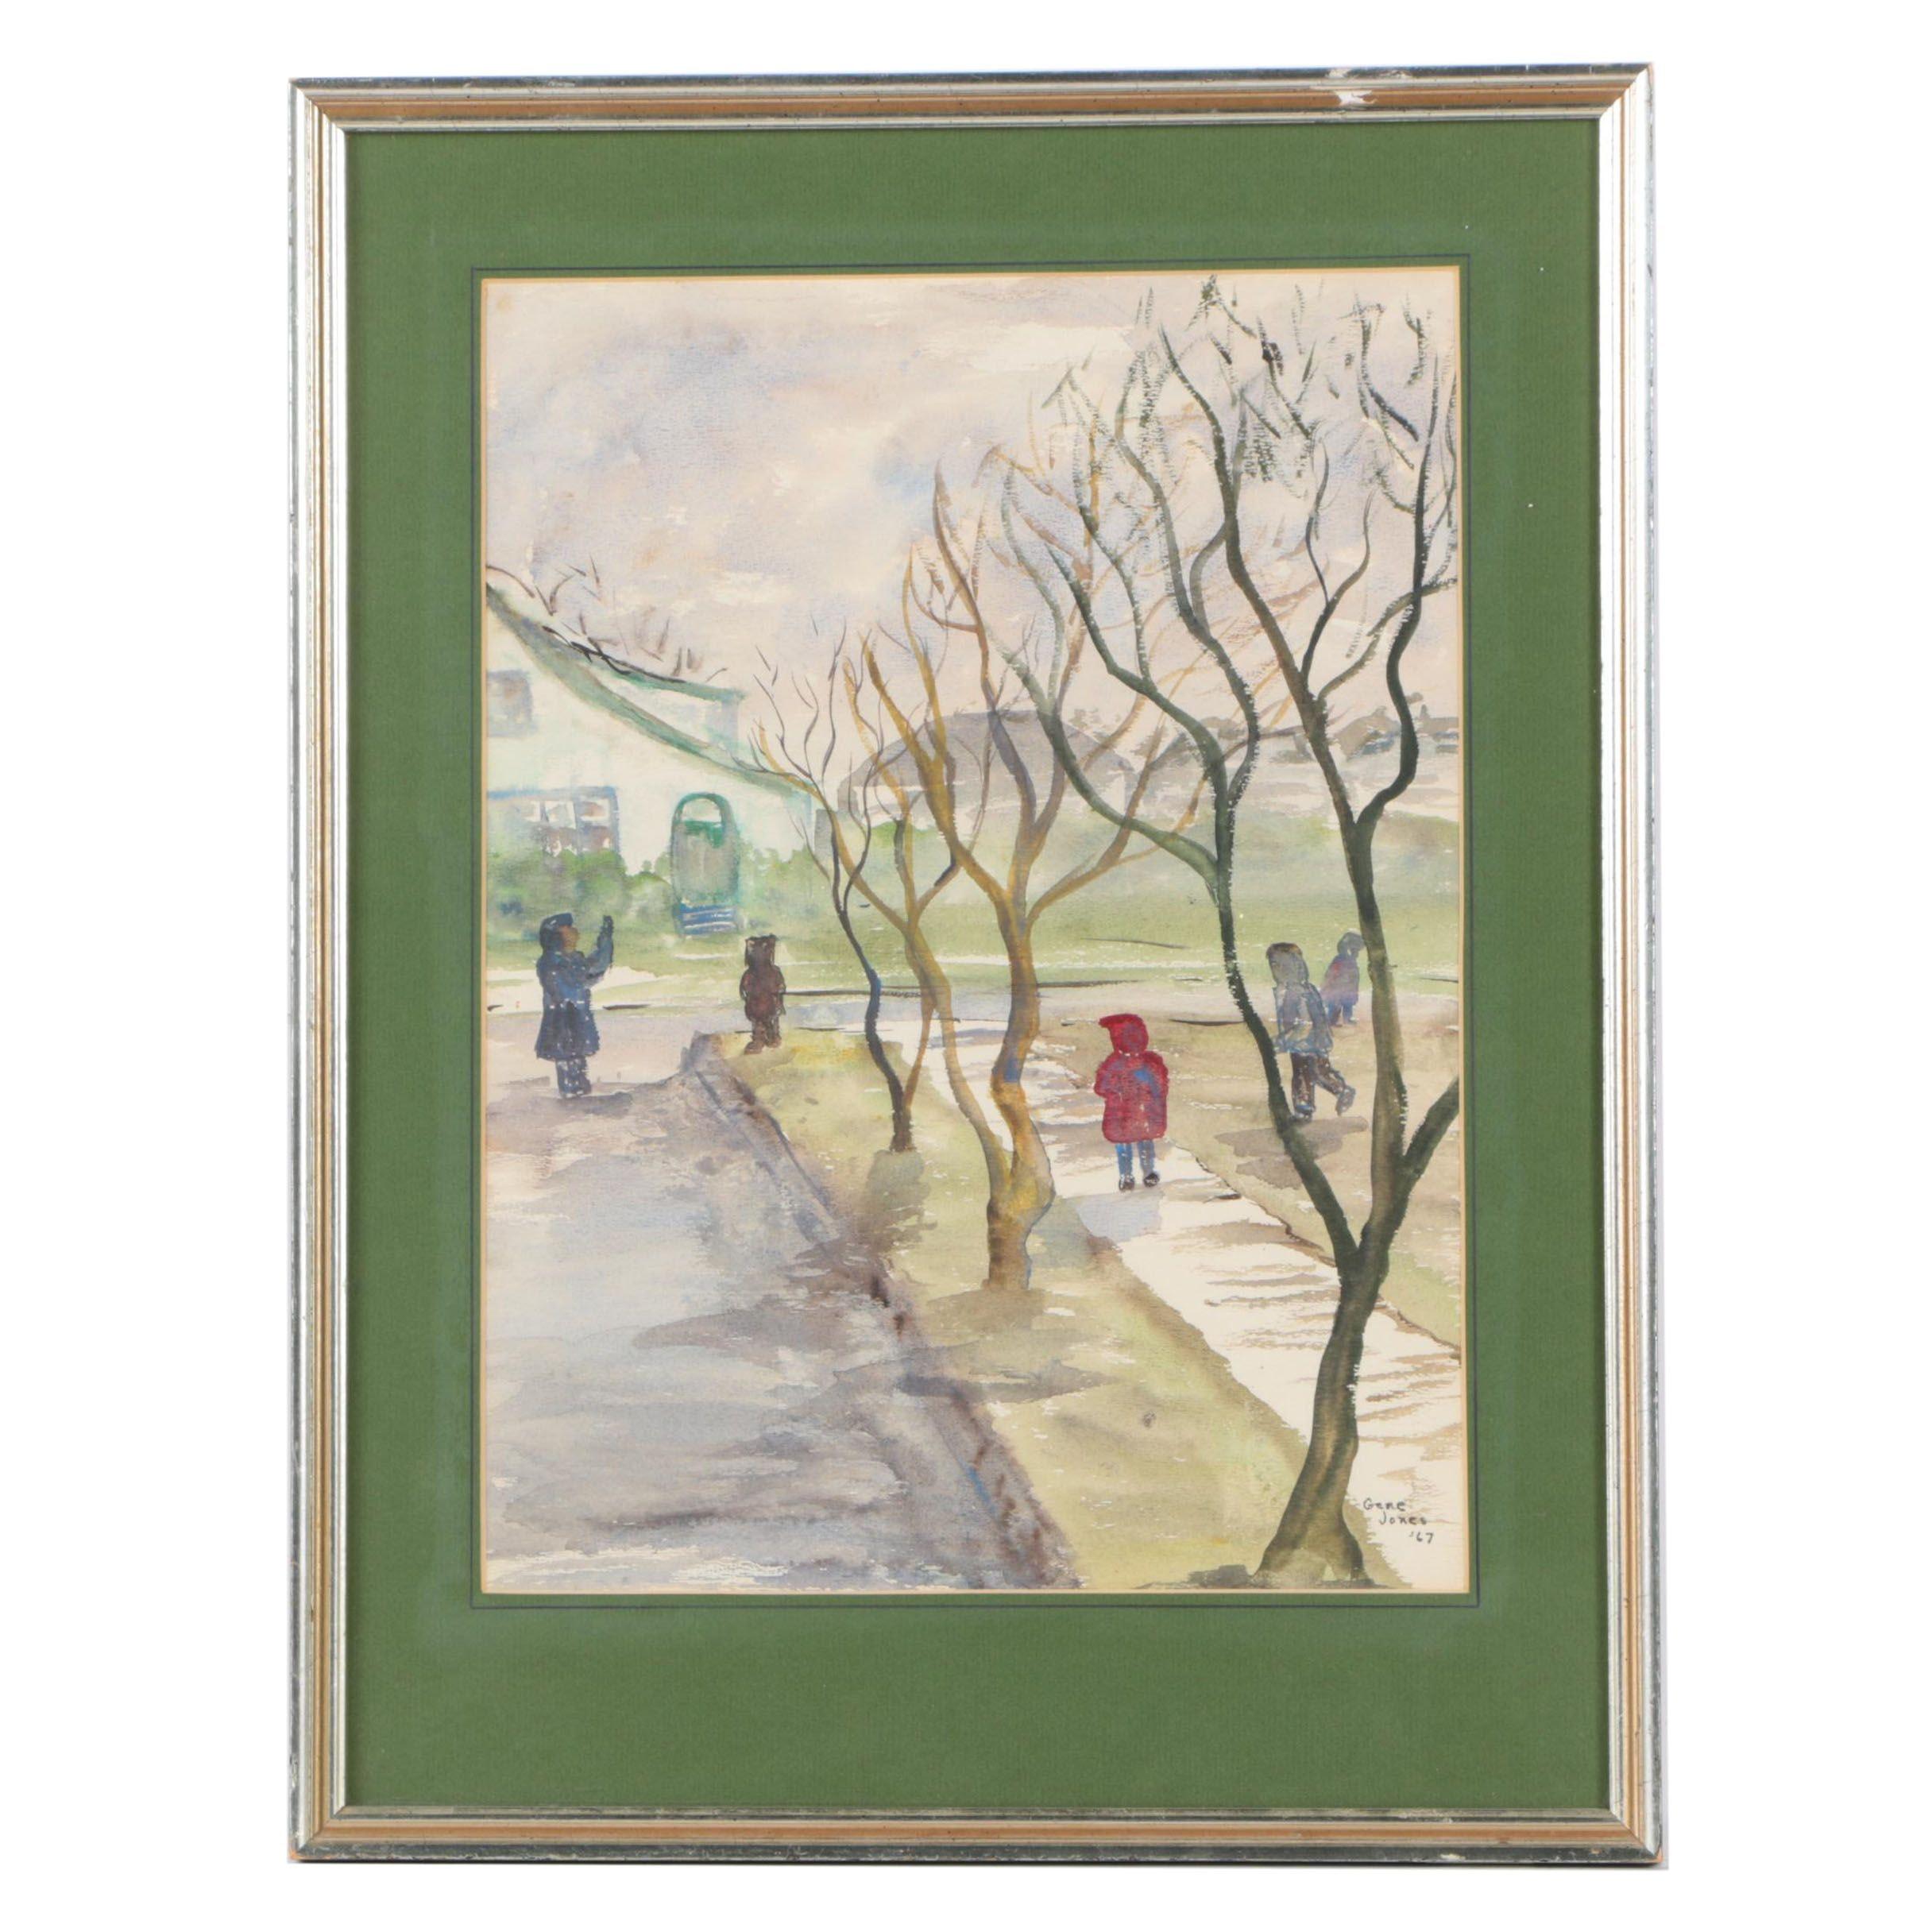 Gene Jones Watercolor Painting on Paper of Street Scene